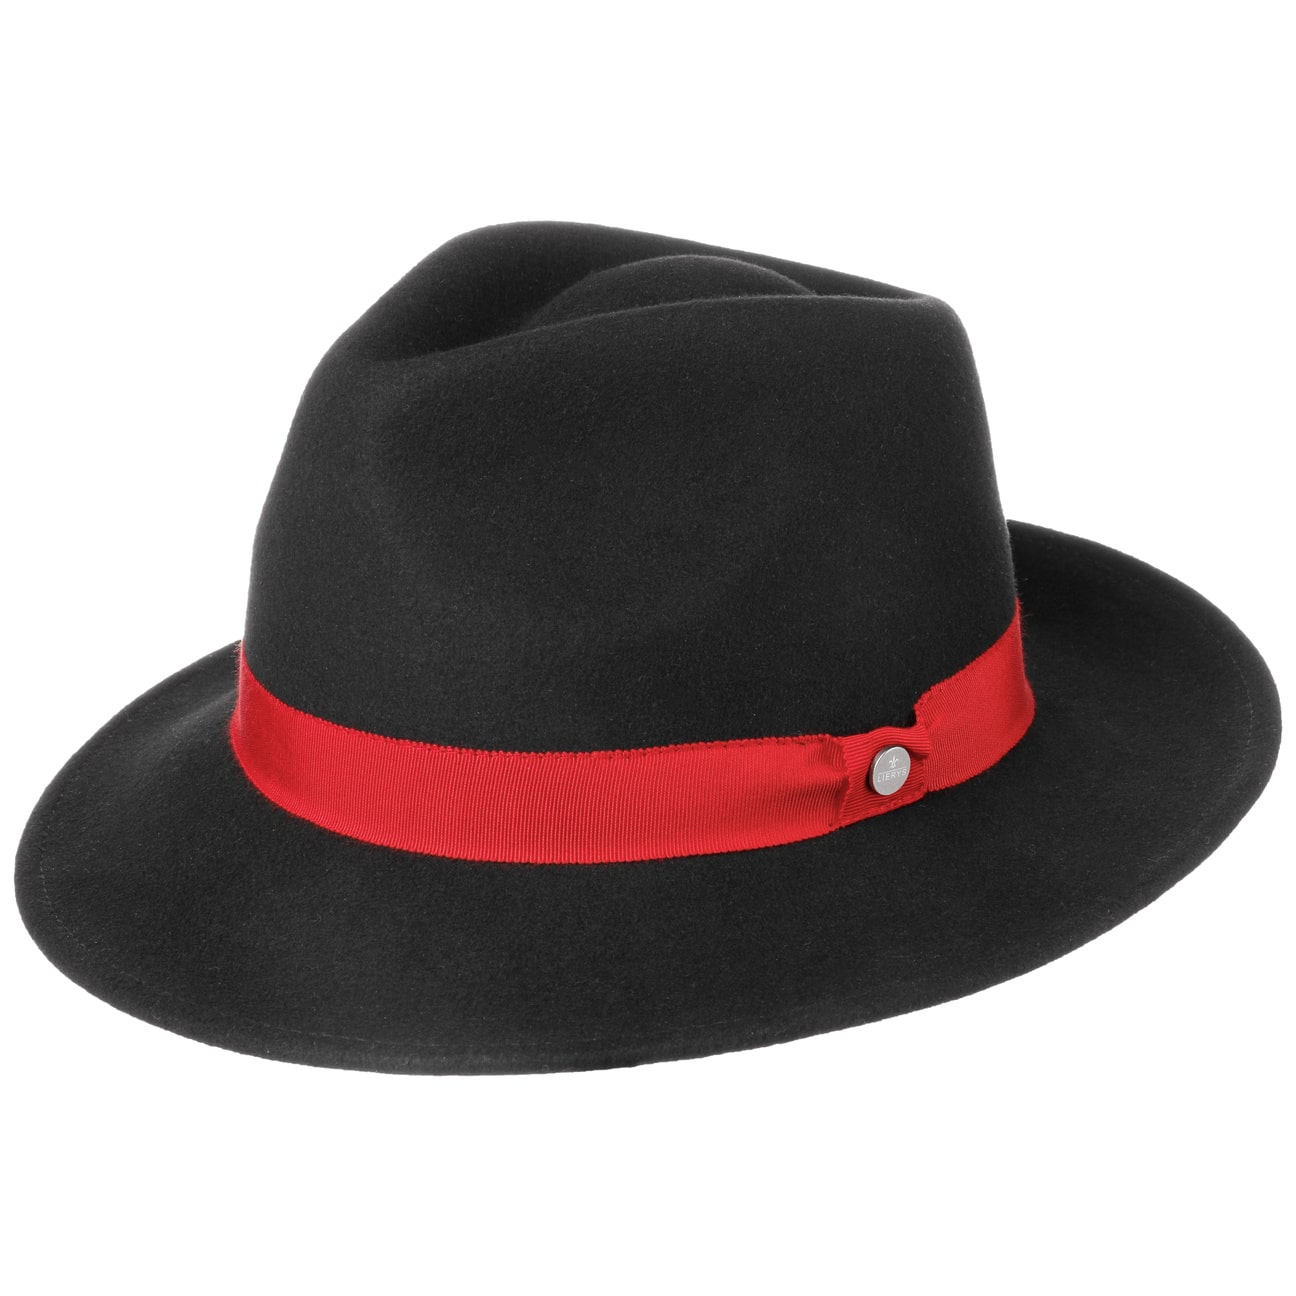 Sombrero Red Corleone by Lierys  sombrero de mafioso